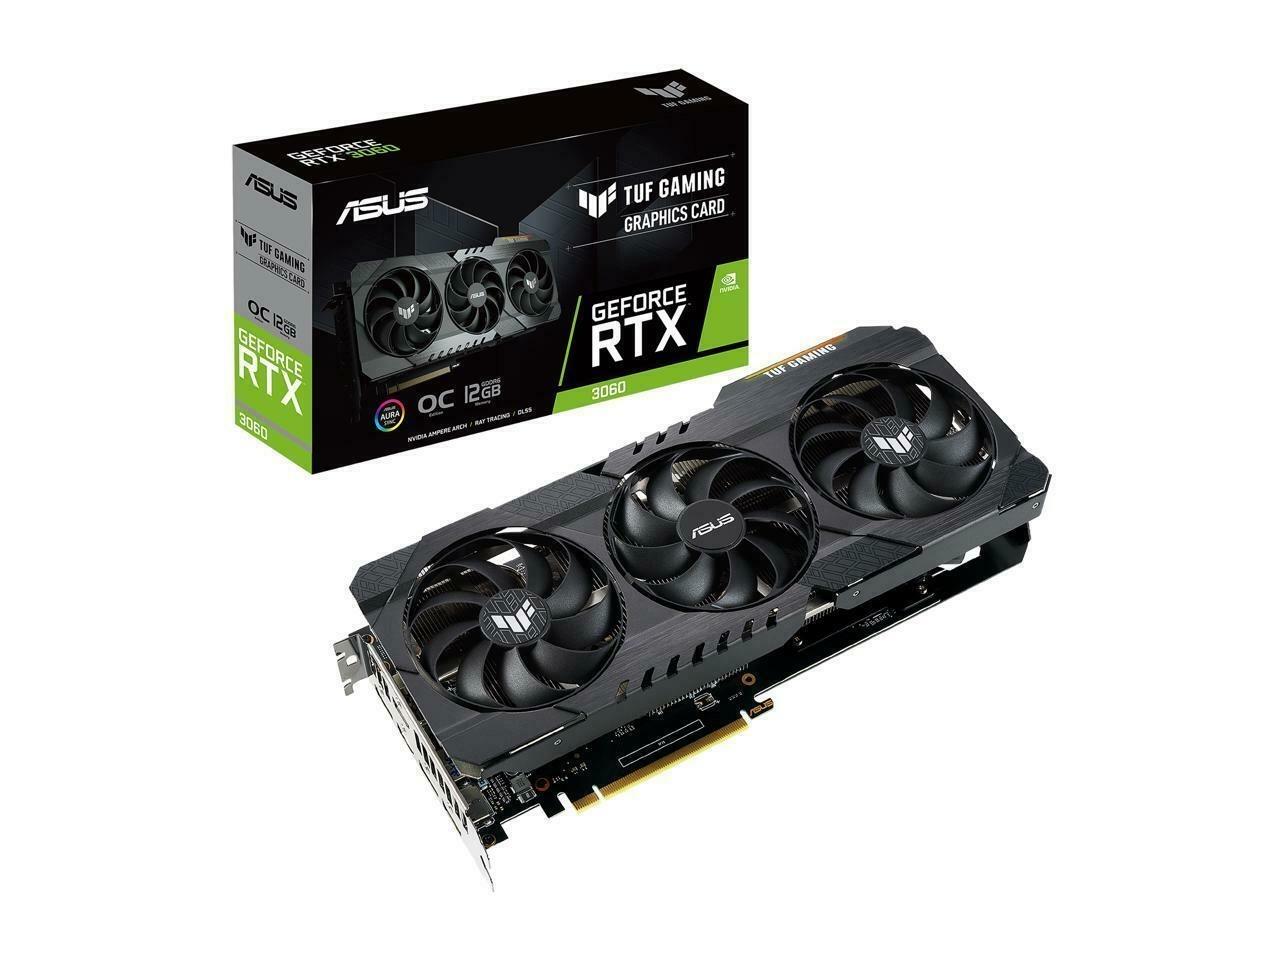 Placa de Video RTX 3060 Asus TUF Gaming OC EDITION 12GB